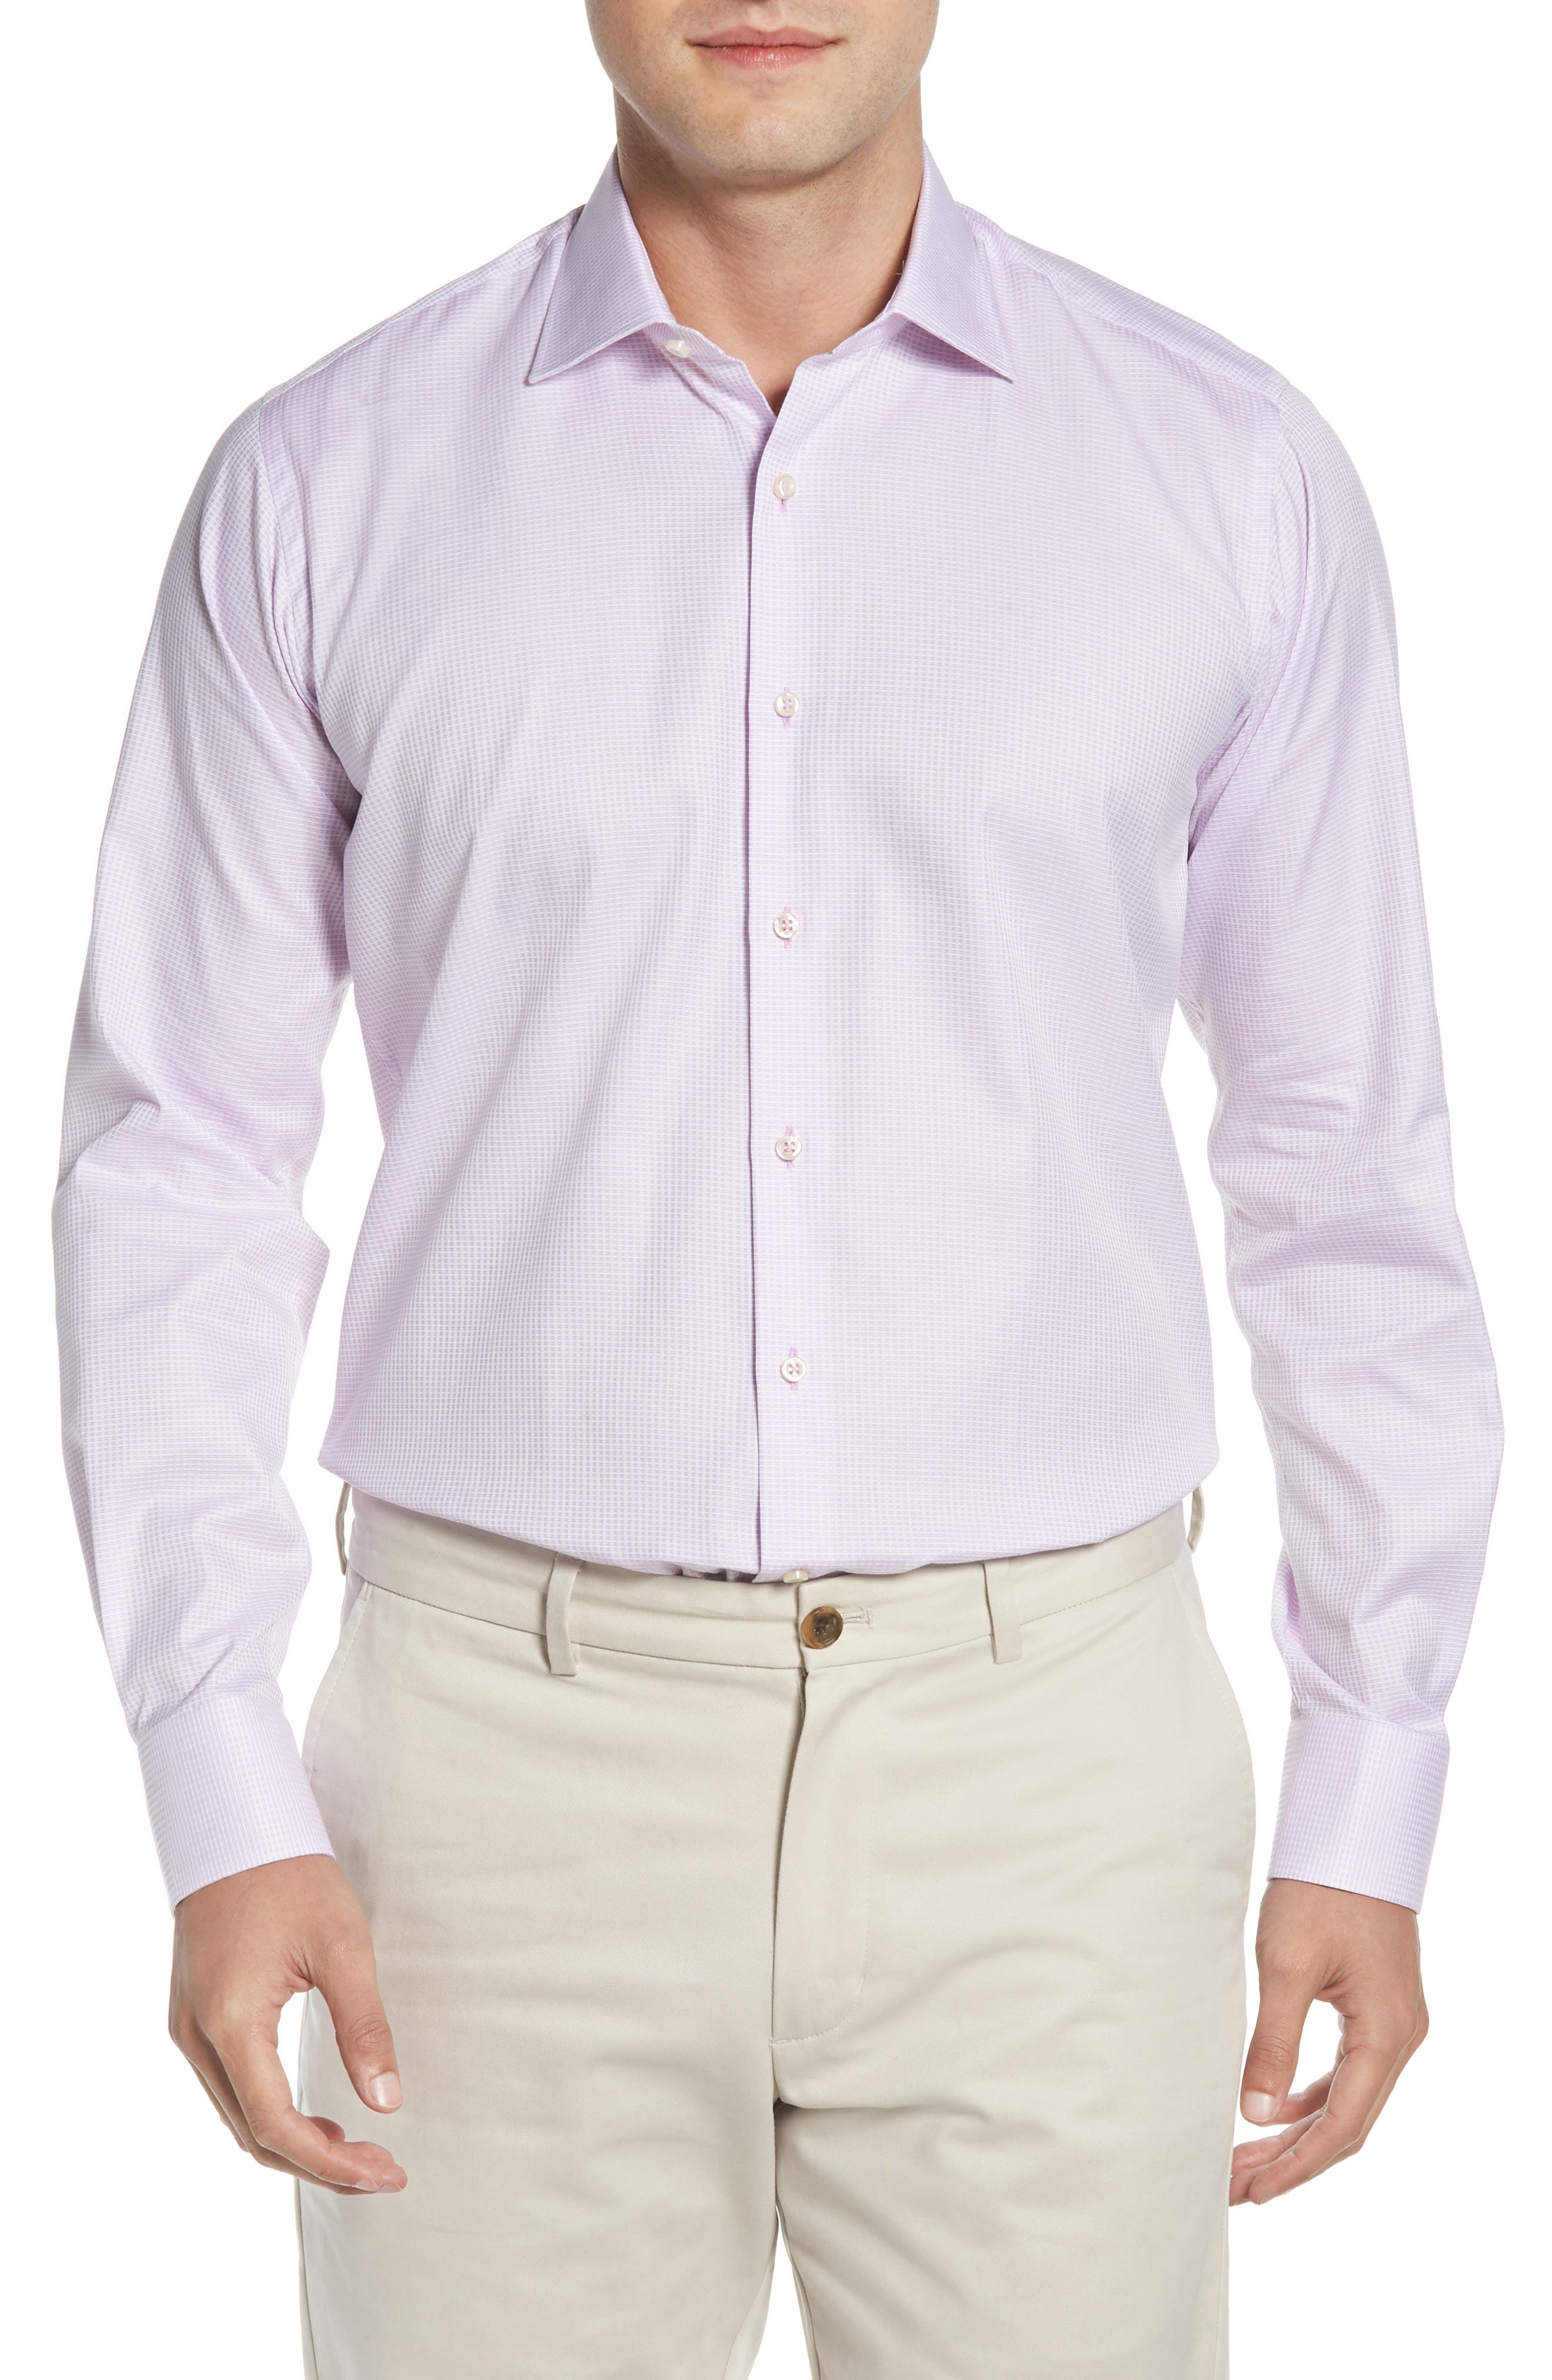 Regular Fit Solid Dress Shirt,                             Main thumbnail 1, color,                             PINK